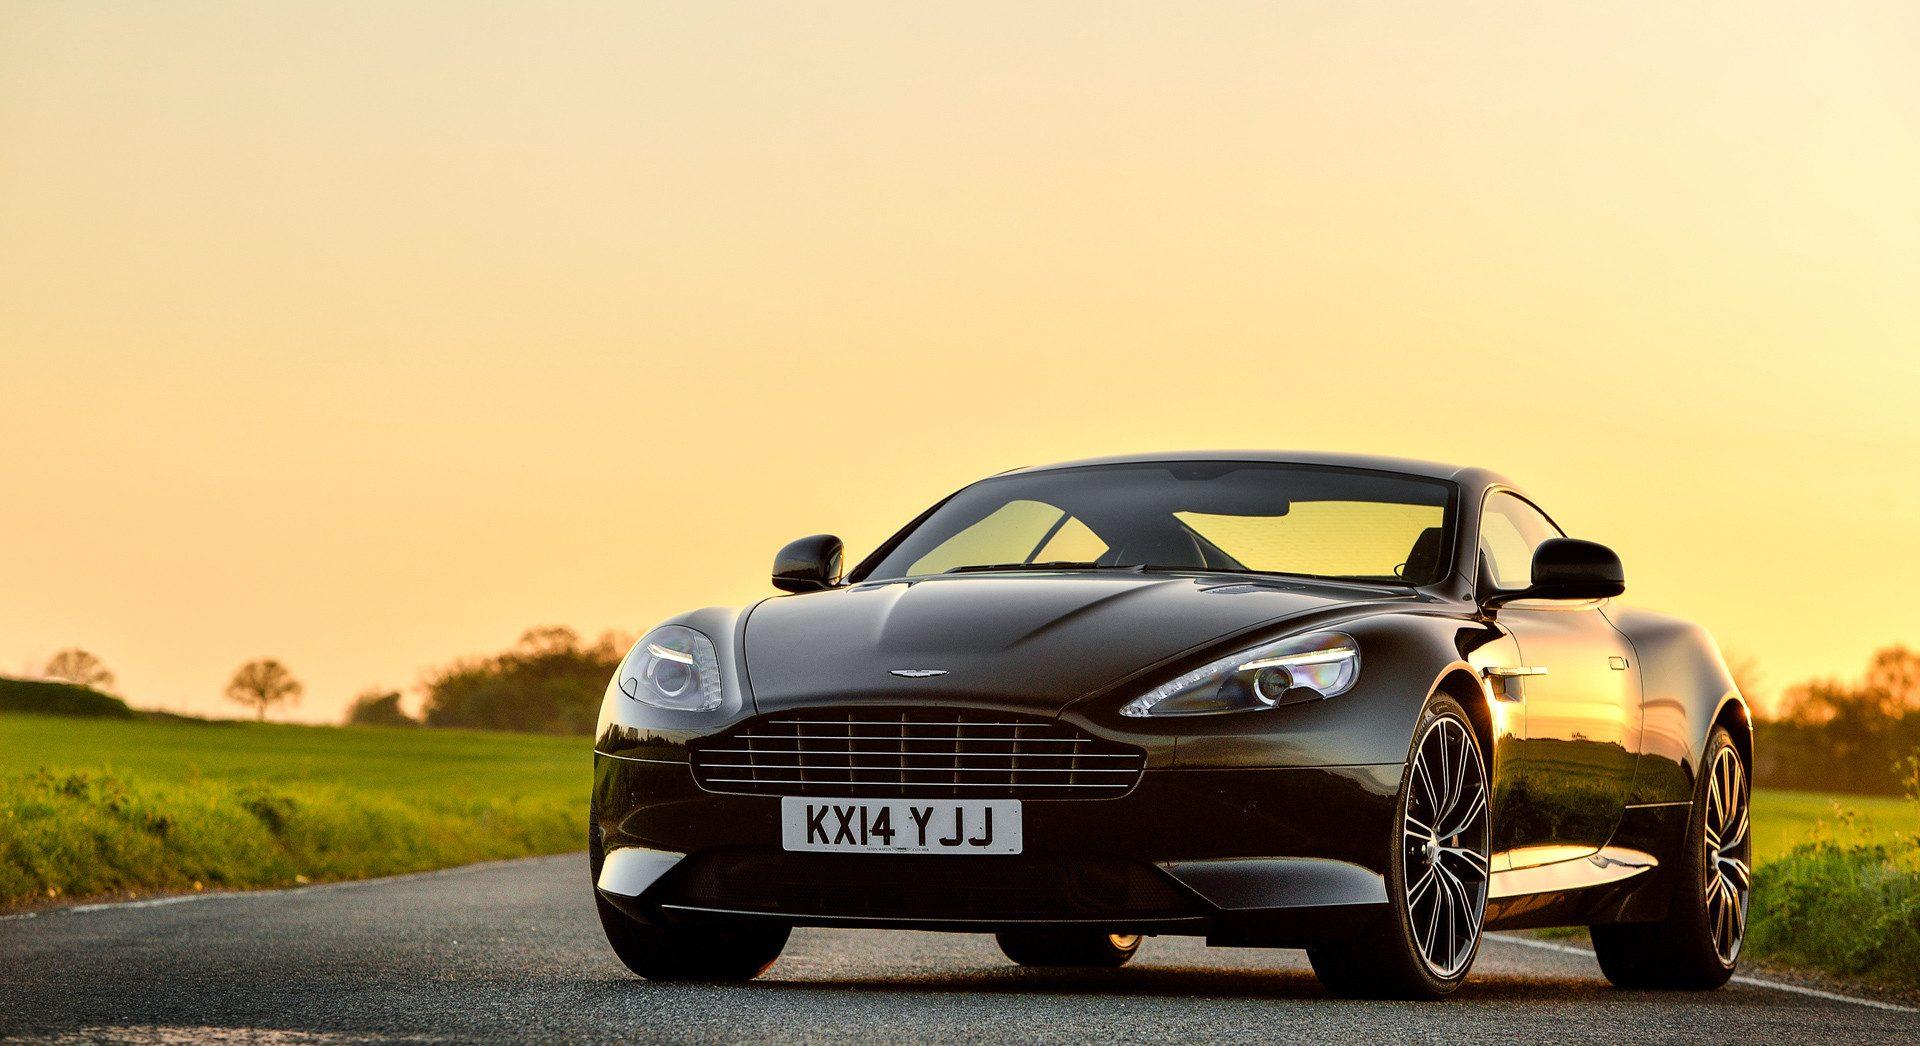 Aston Martin Db9 Carbon Edition Wallpapers Dark Beauty Asco